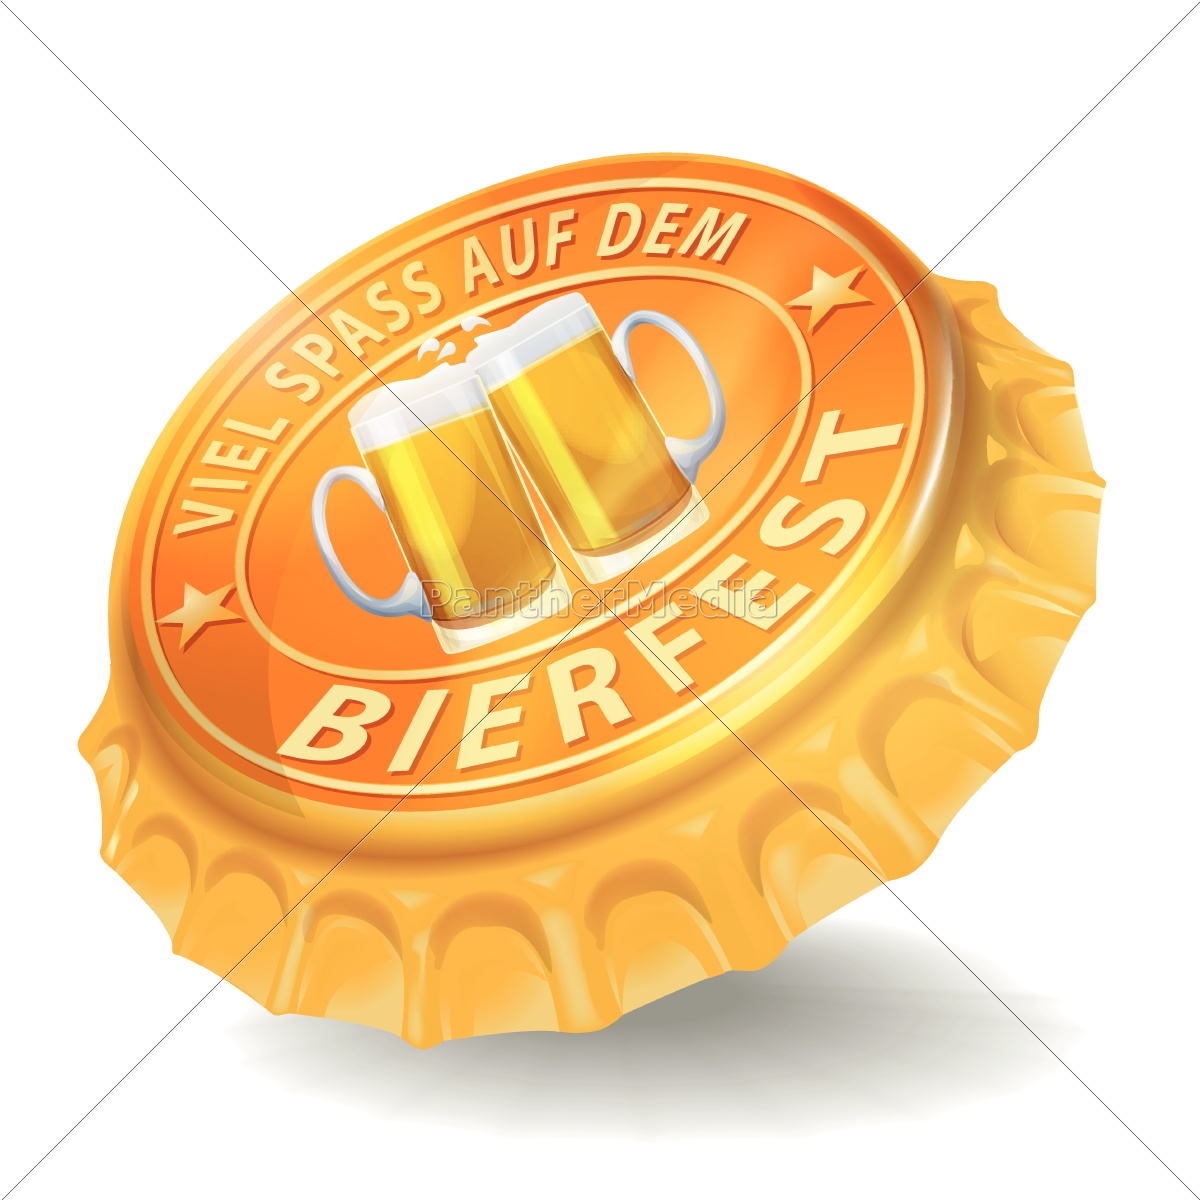 bottle, cork, beerfest - 10253477